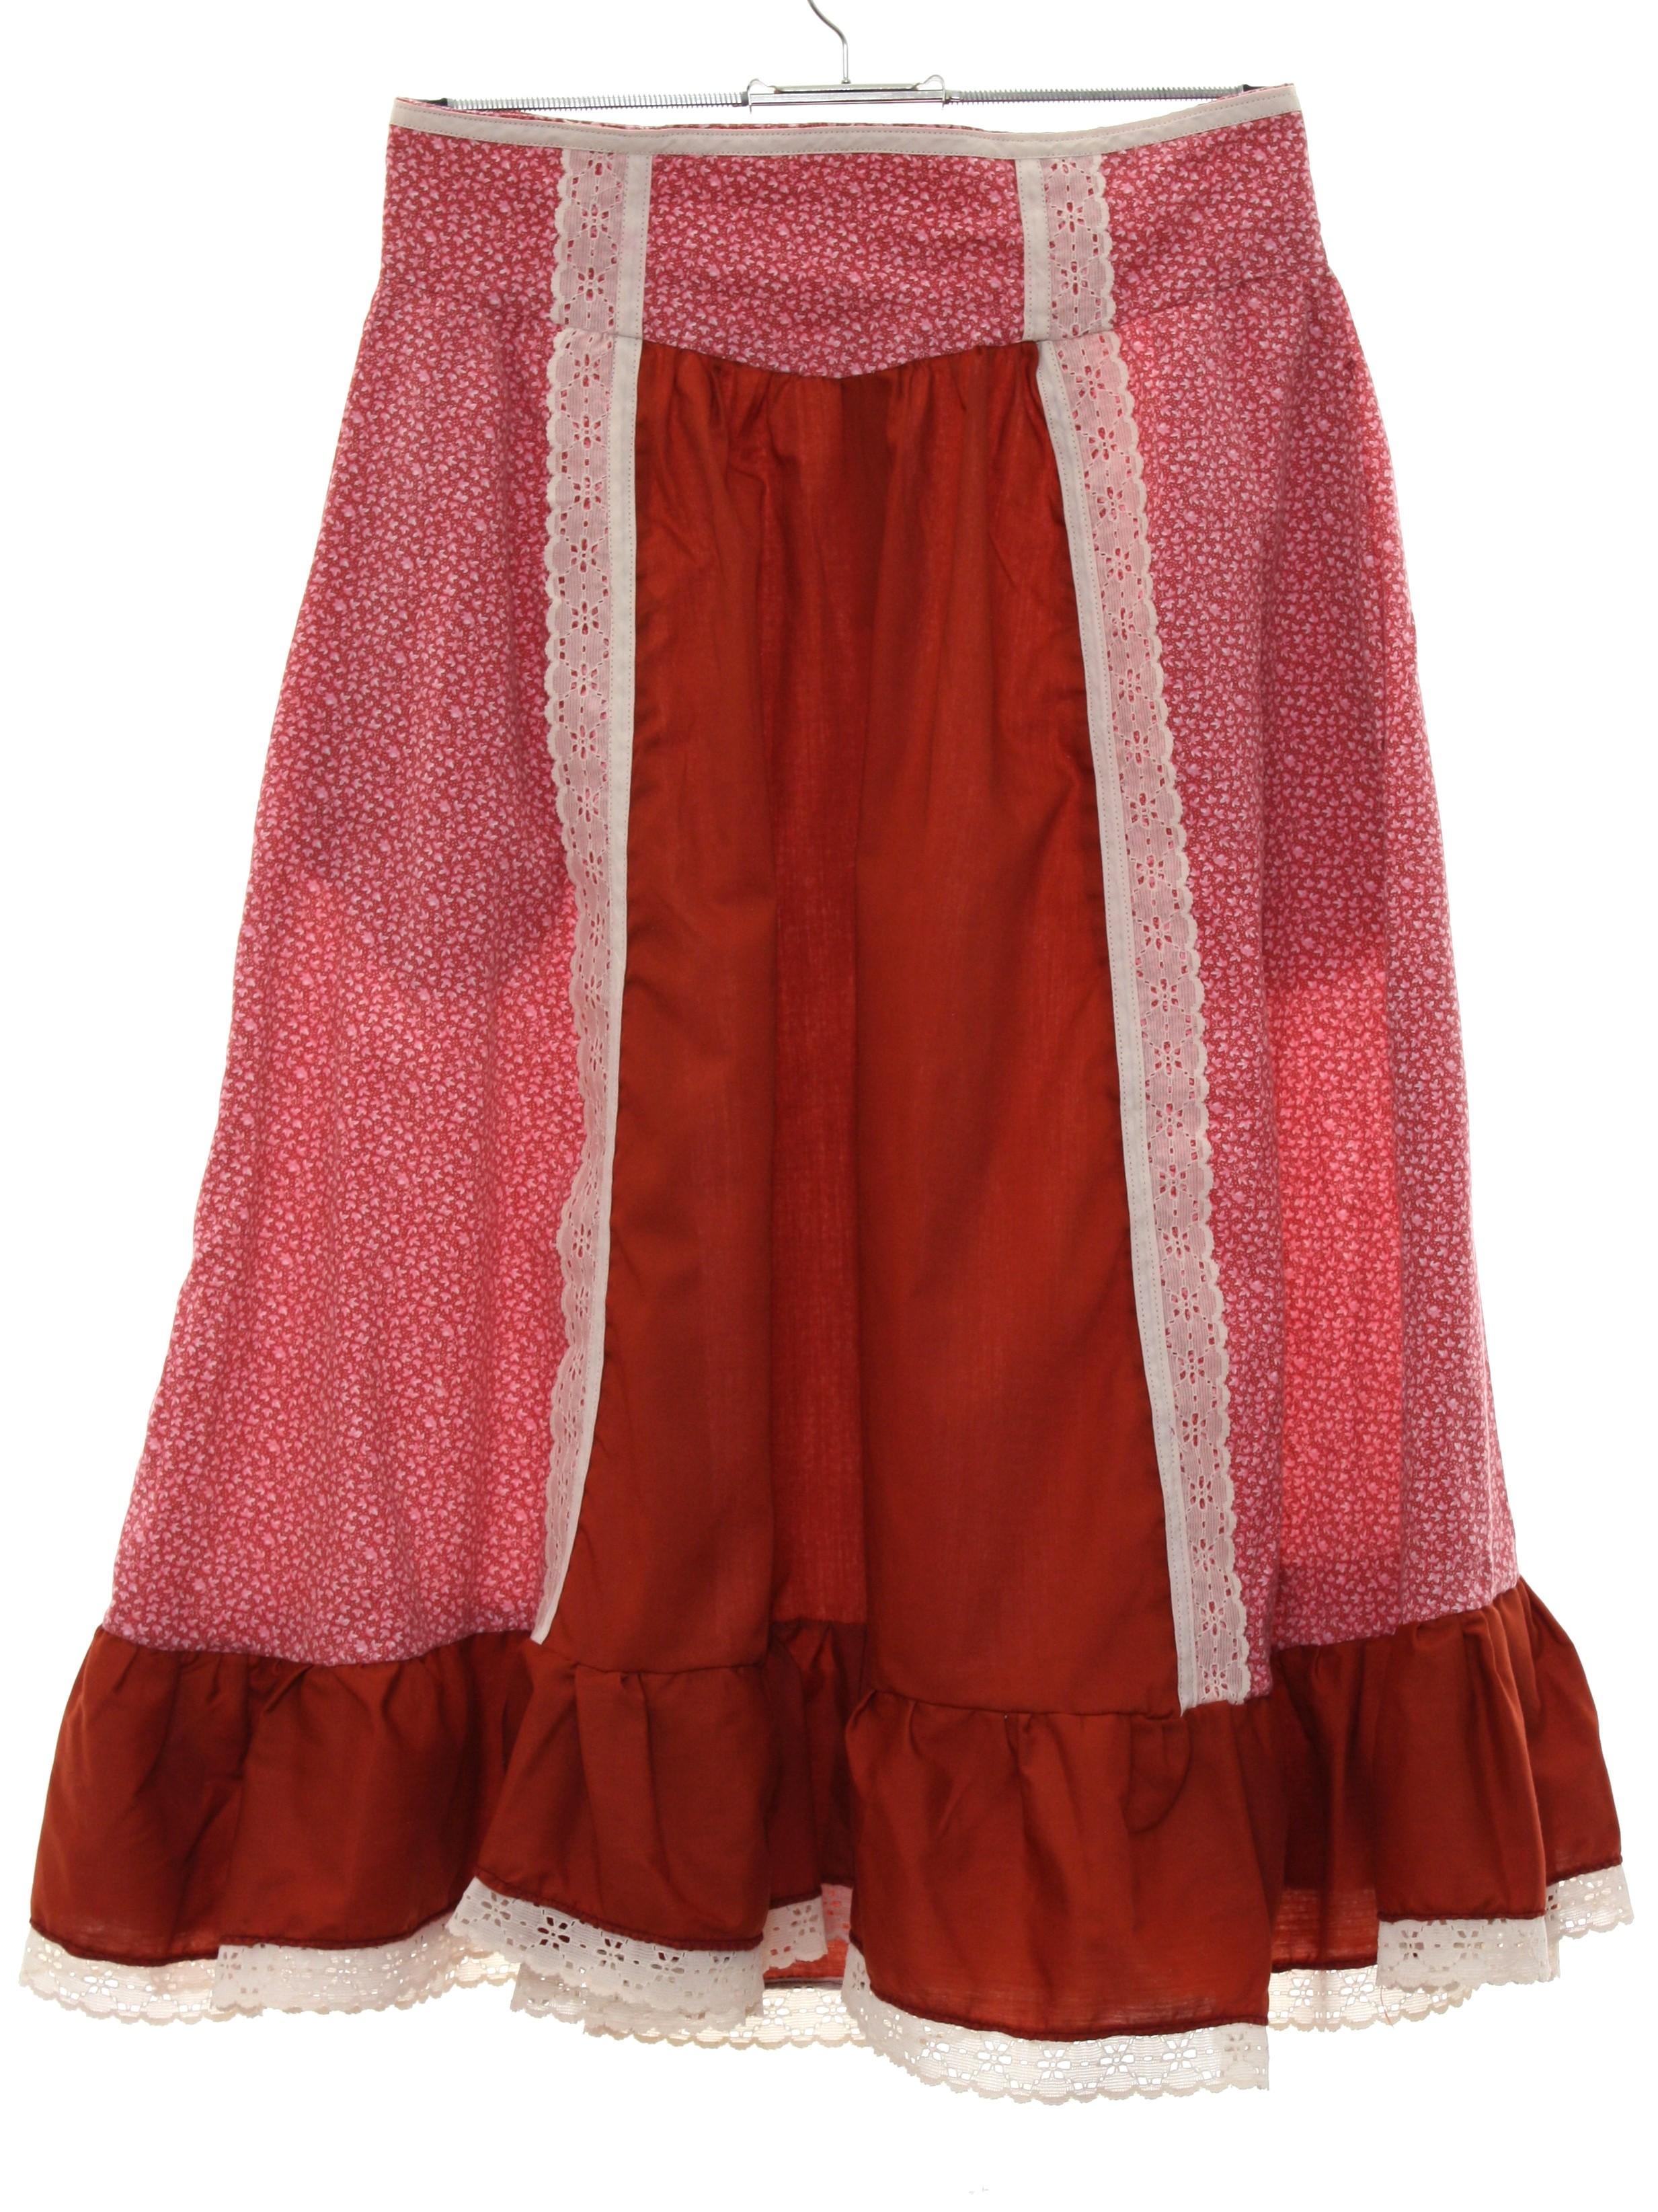 4f6b0a8ba6 Vintage 70s Hippie Skirt  70s -homesewn- Womens dark rust